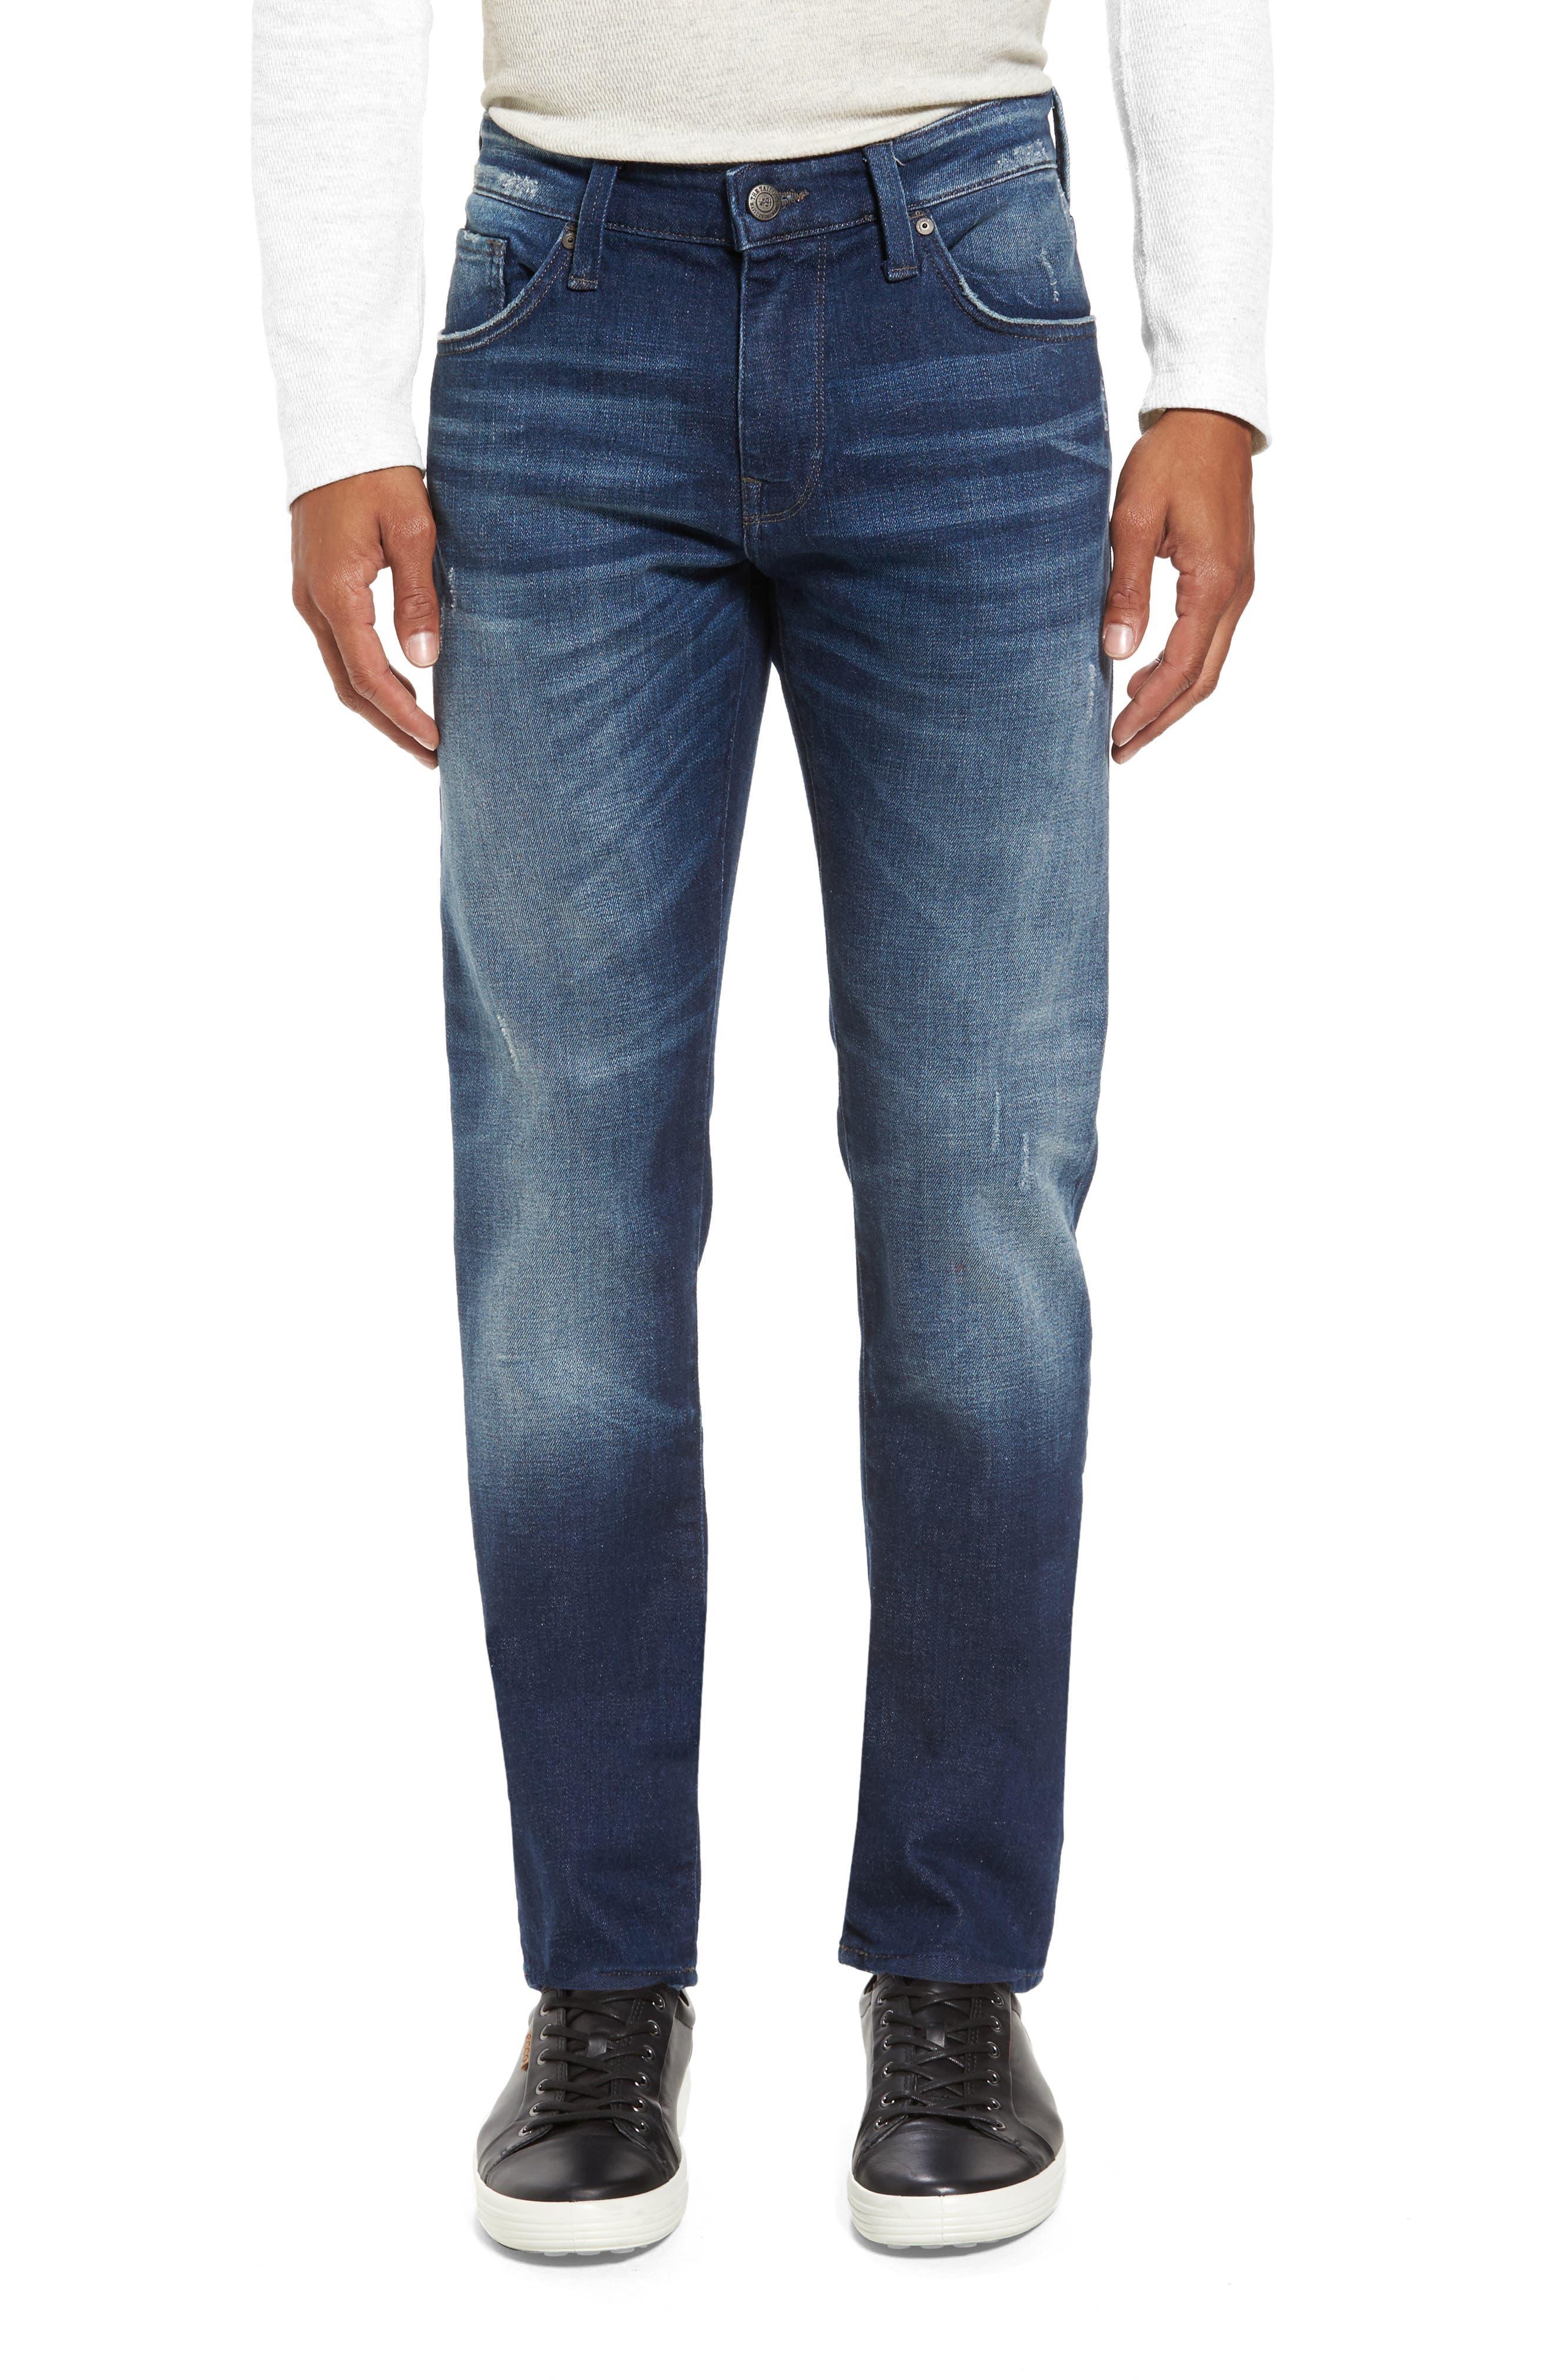 Jake Easy Slim Fit Jeans,                         Main,                         color, 401